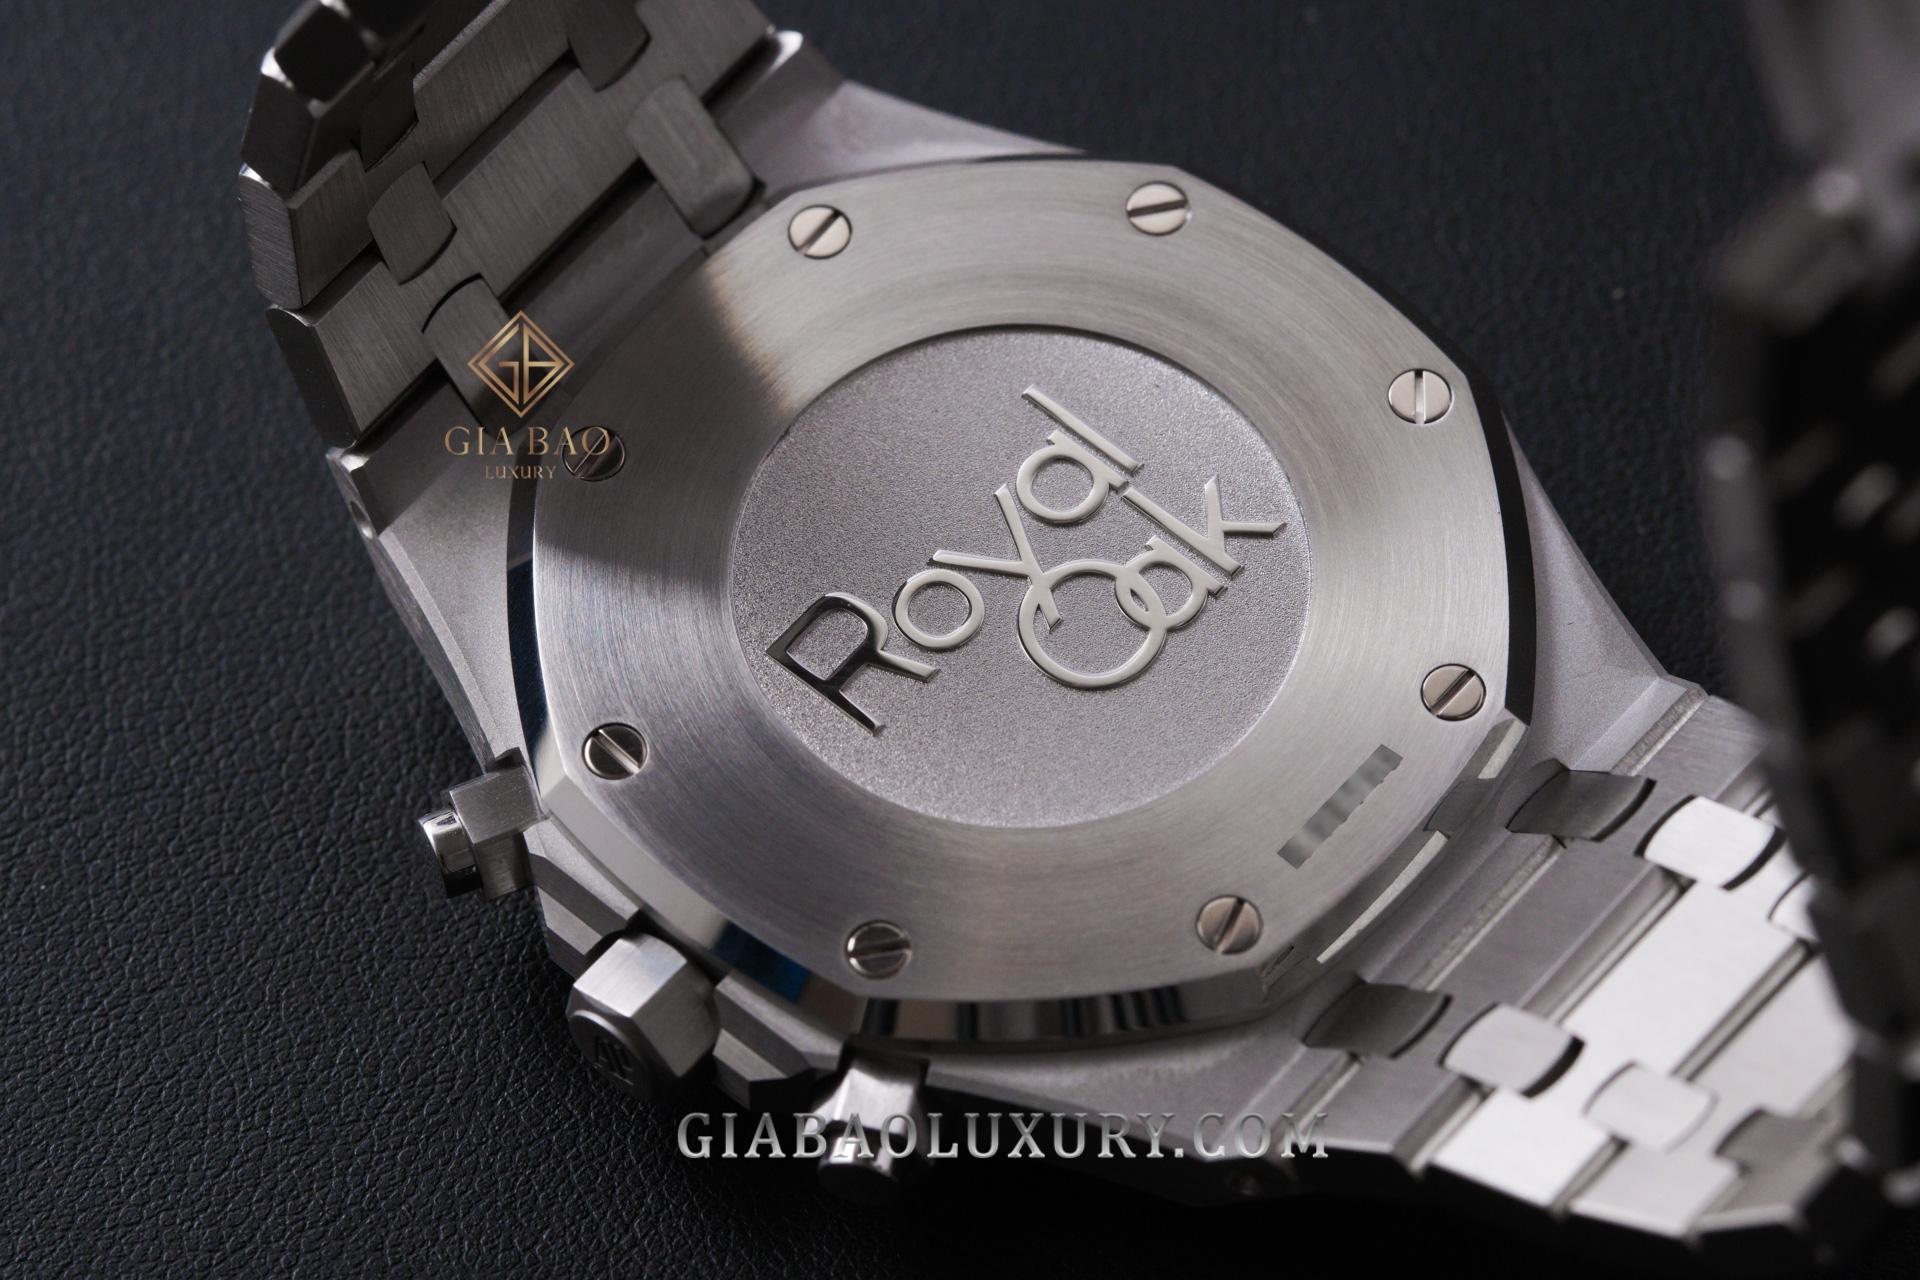 Đồng Hồ Audemars Piguet Royal Oak Chronograph 26331ST.OO.1220ST.01